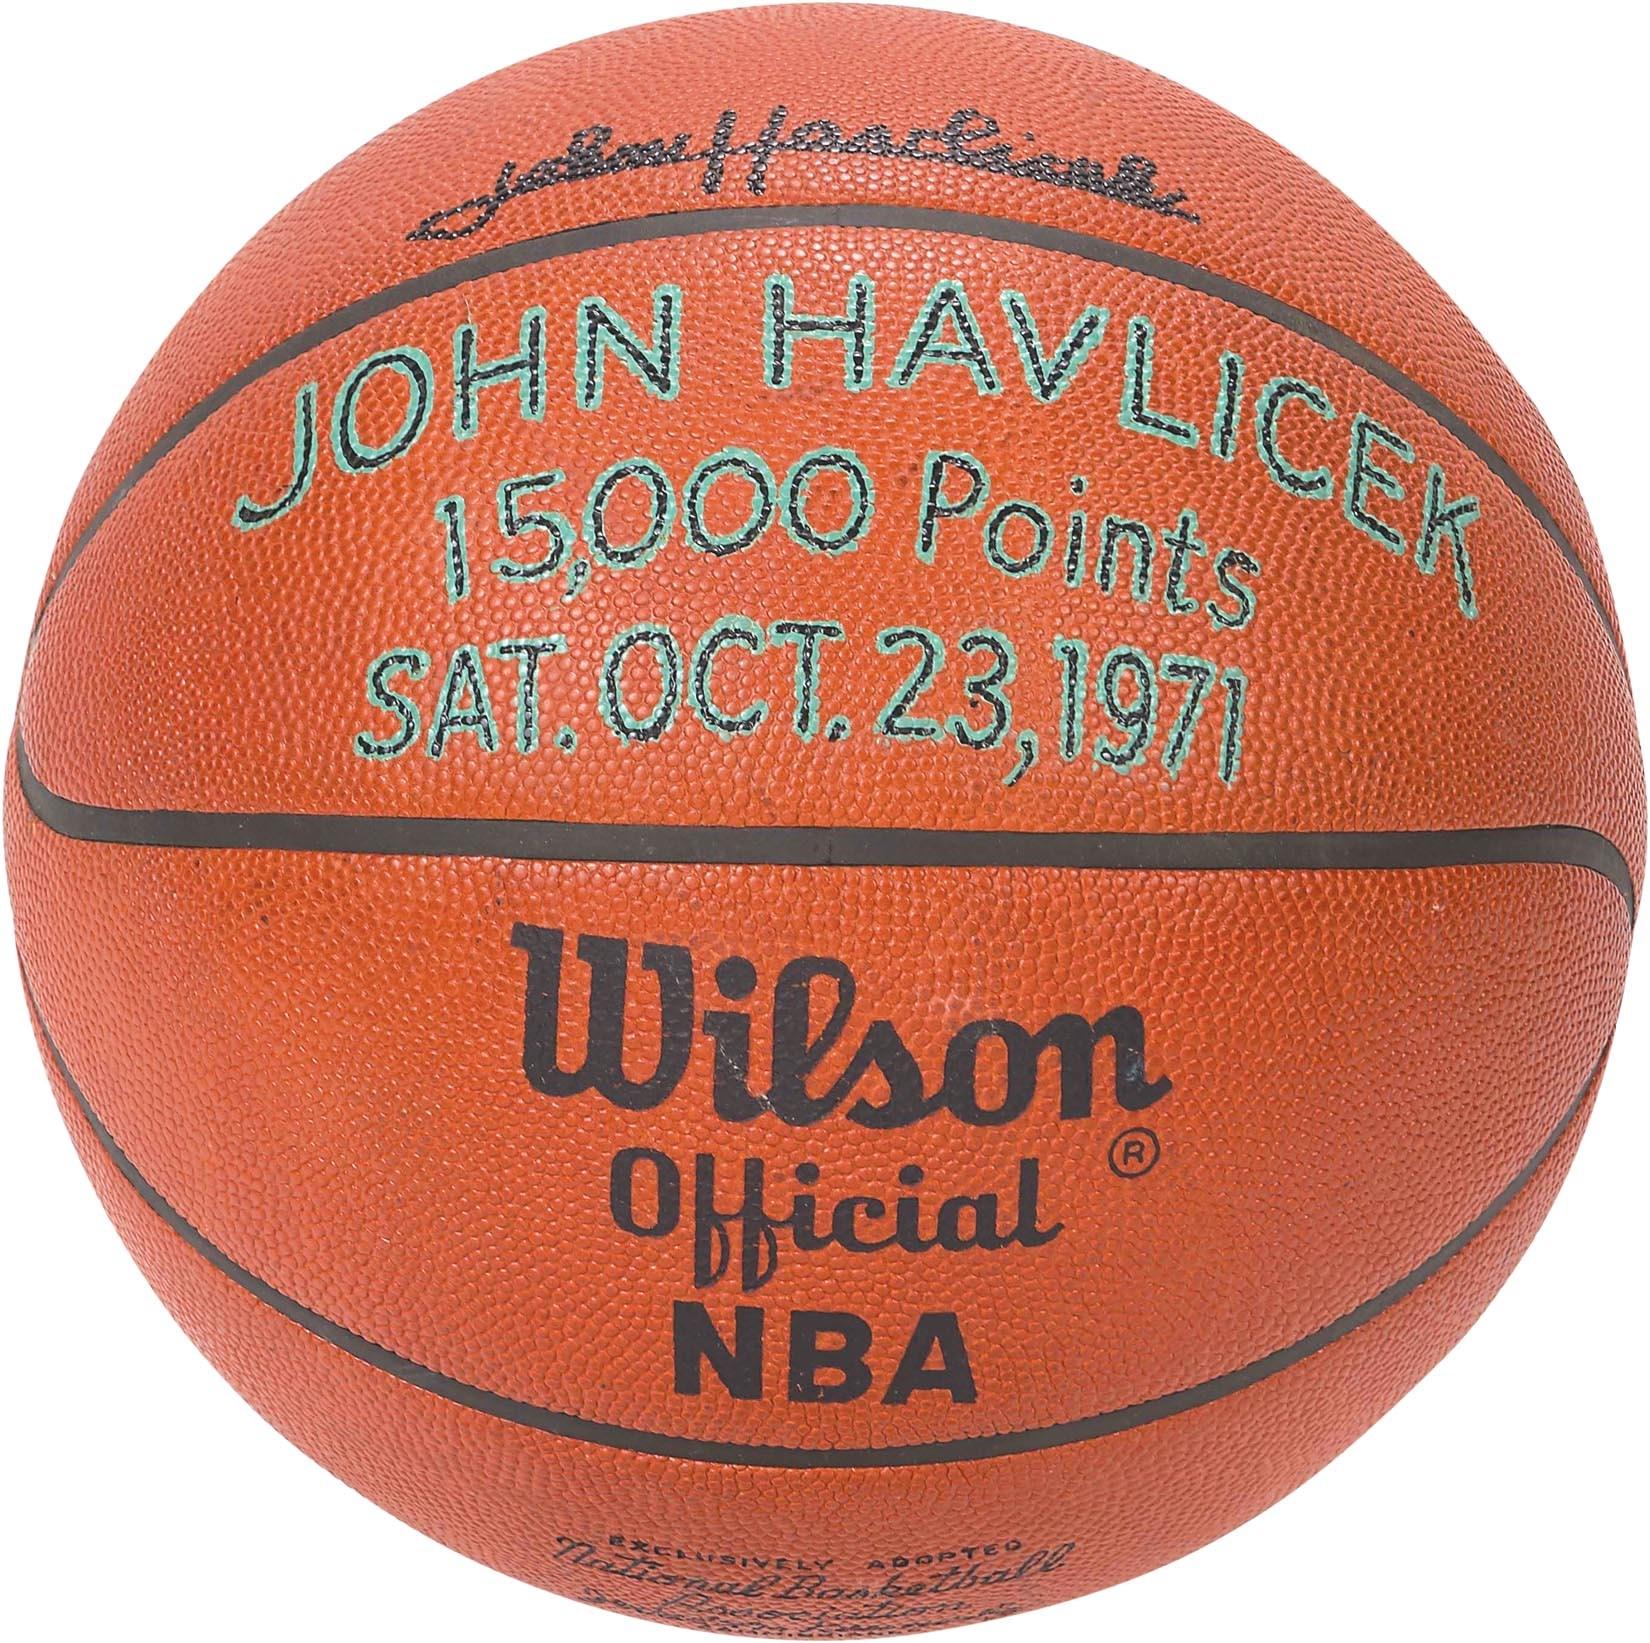 Basketball - 2018 Invitational